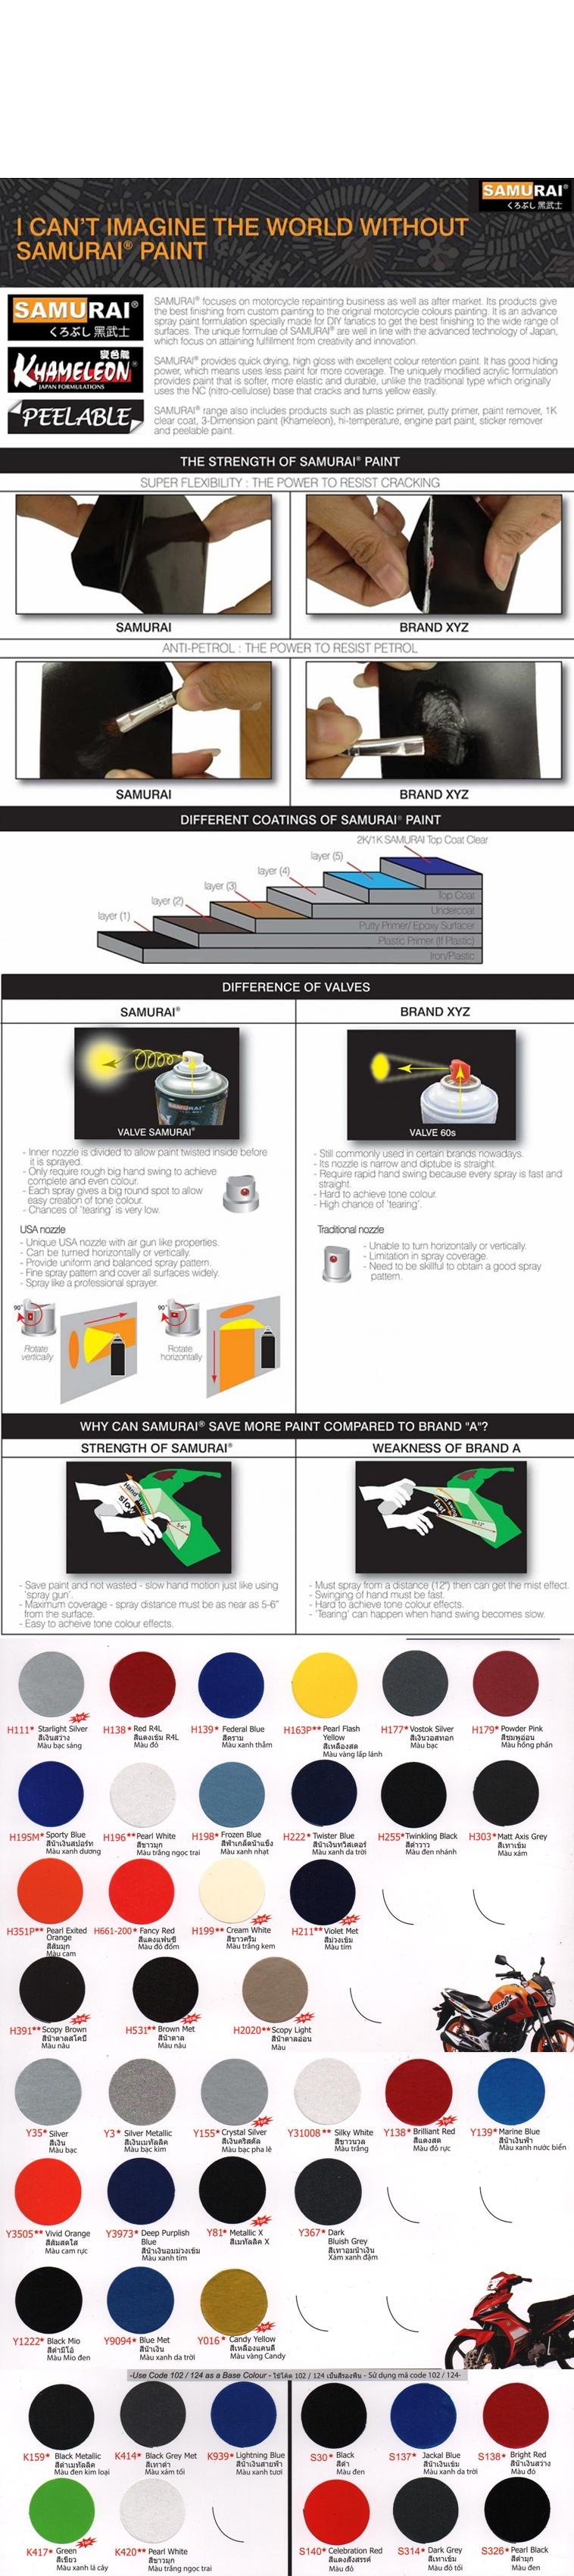 Samurai S326 Pearl Black Suzuki Color Spray Paint 400ml Made In Can Gun Cat Pilox Aerosol Specifications Of Malaysia